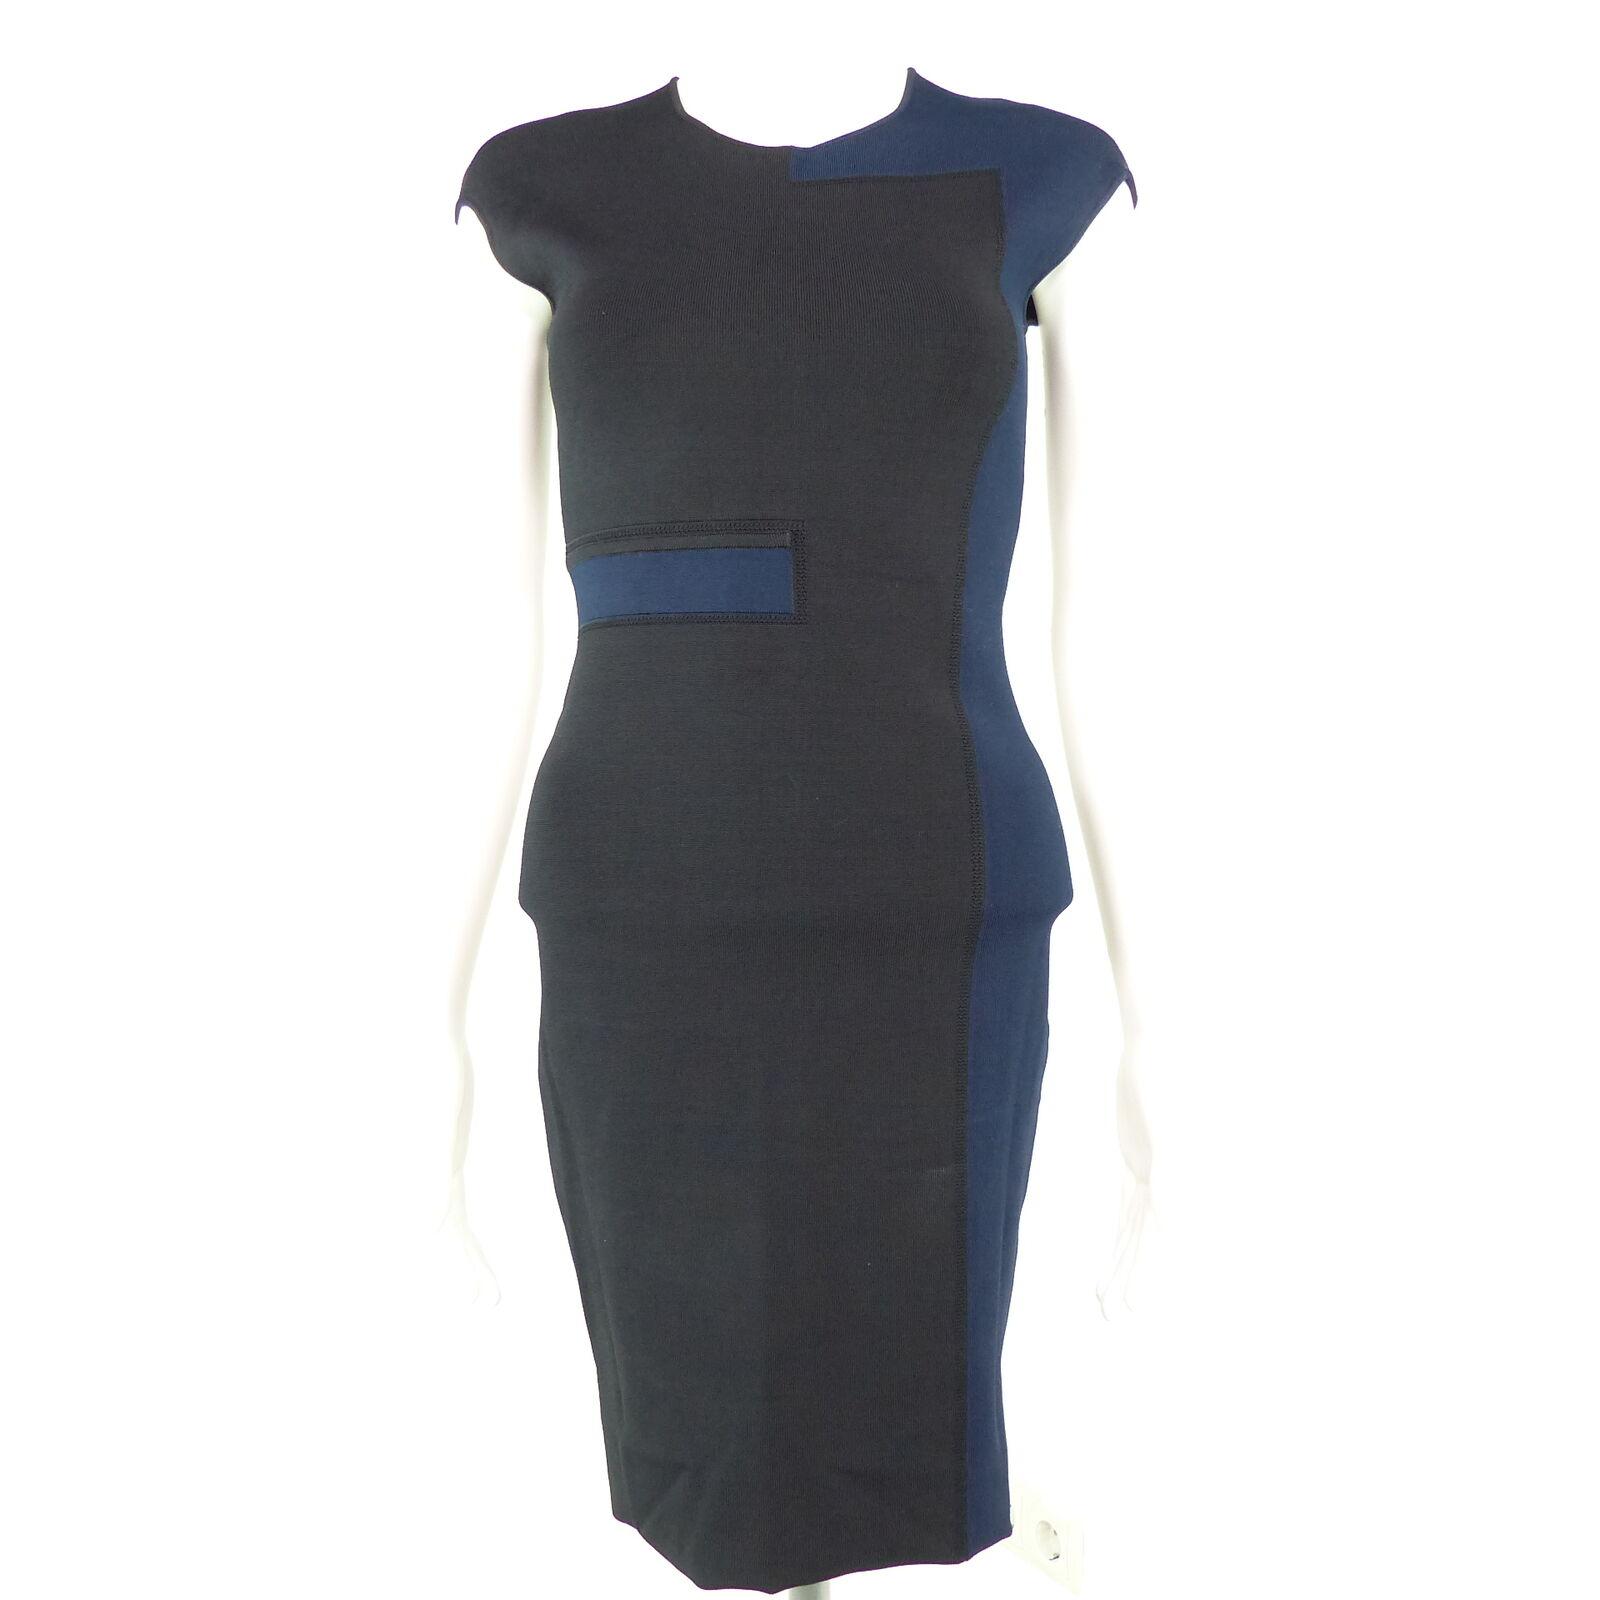 ALEXANDER WANG Kleid Gr. S schwarz blau Damen Figurbetont Stretch Kleid Robe